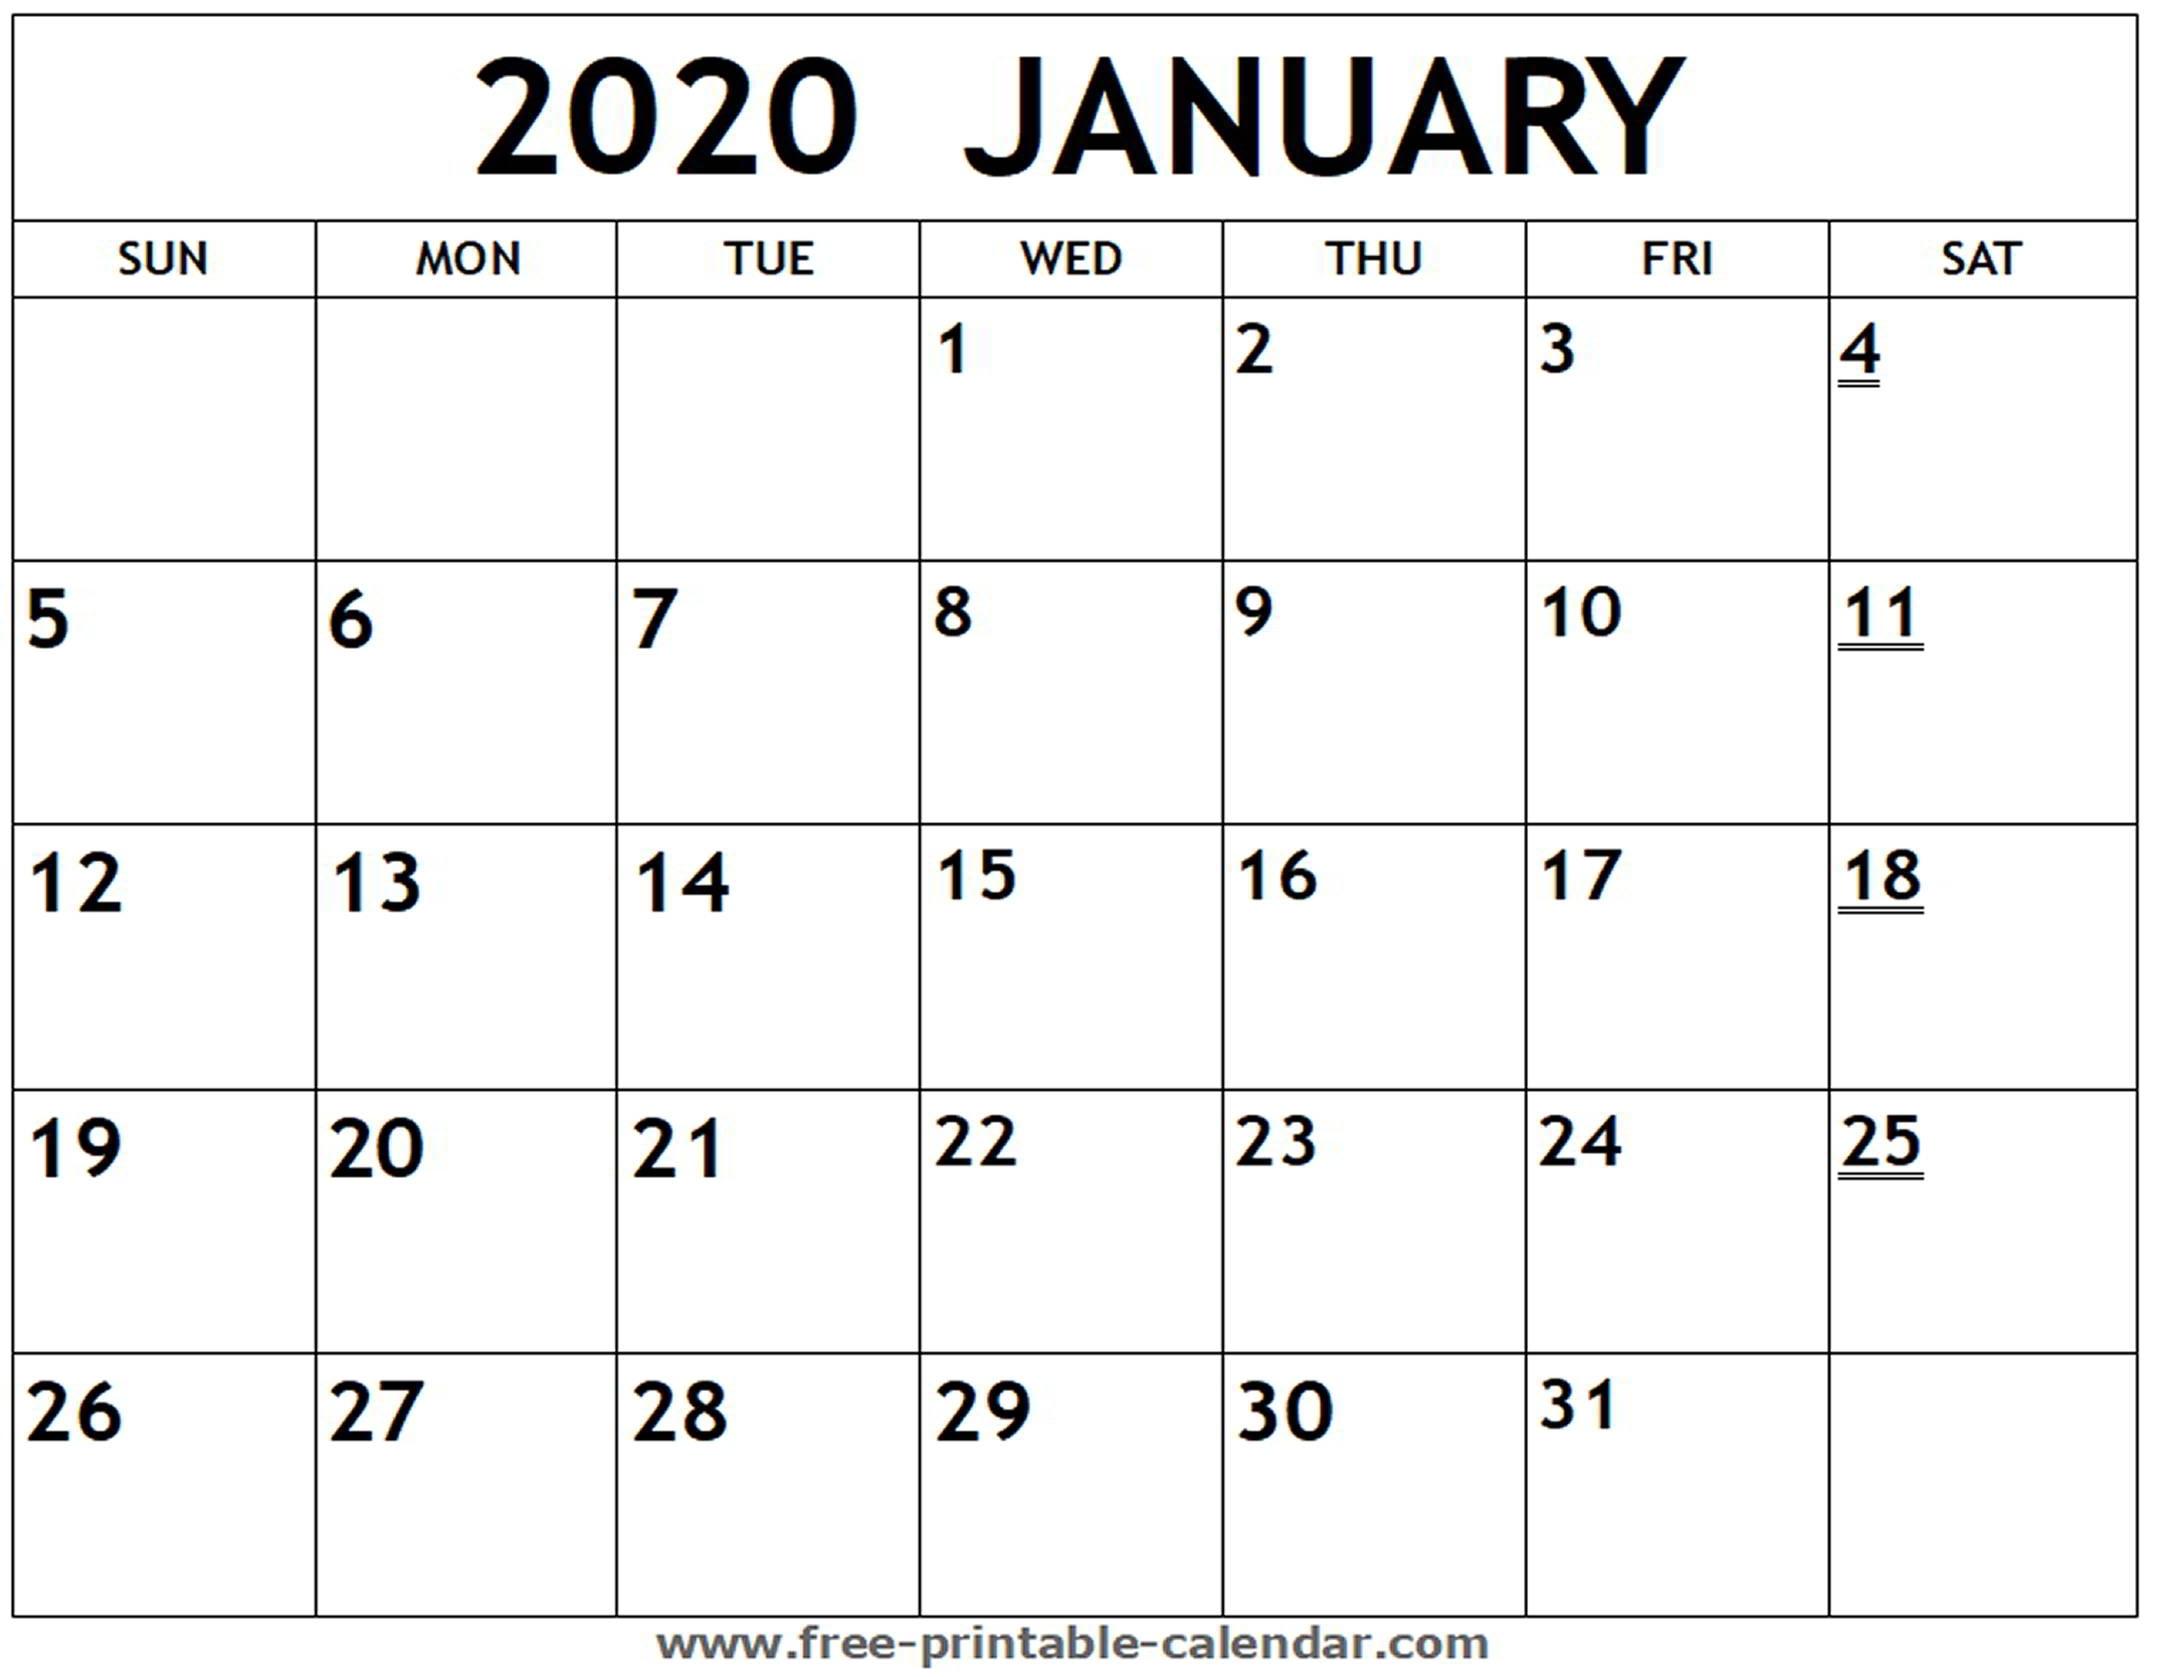 Printable 2020 Monthly Calendar Free – Urgup.ewrs2018